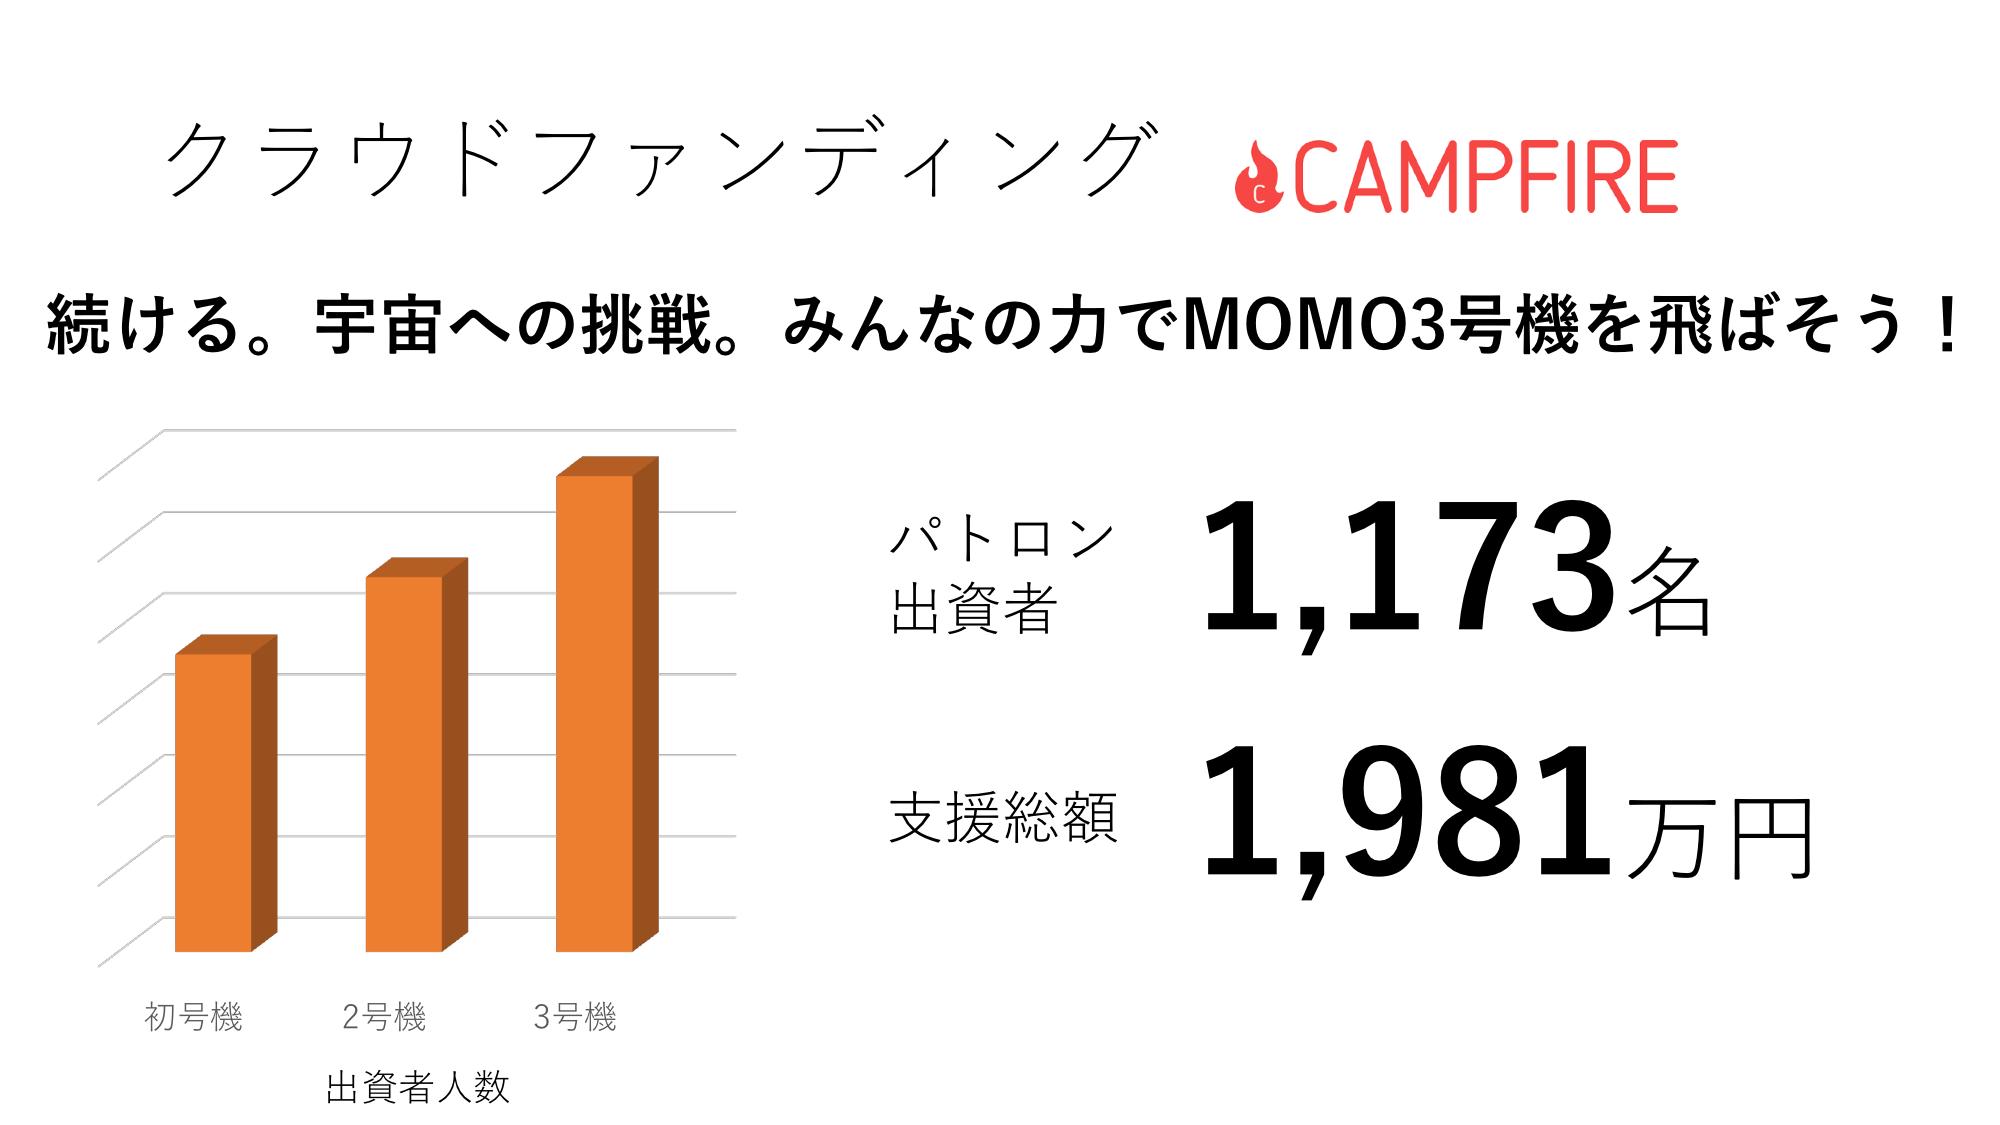 f:id:Imamura:20190414214001p:plain